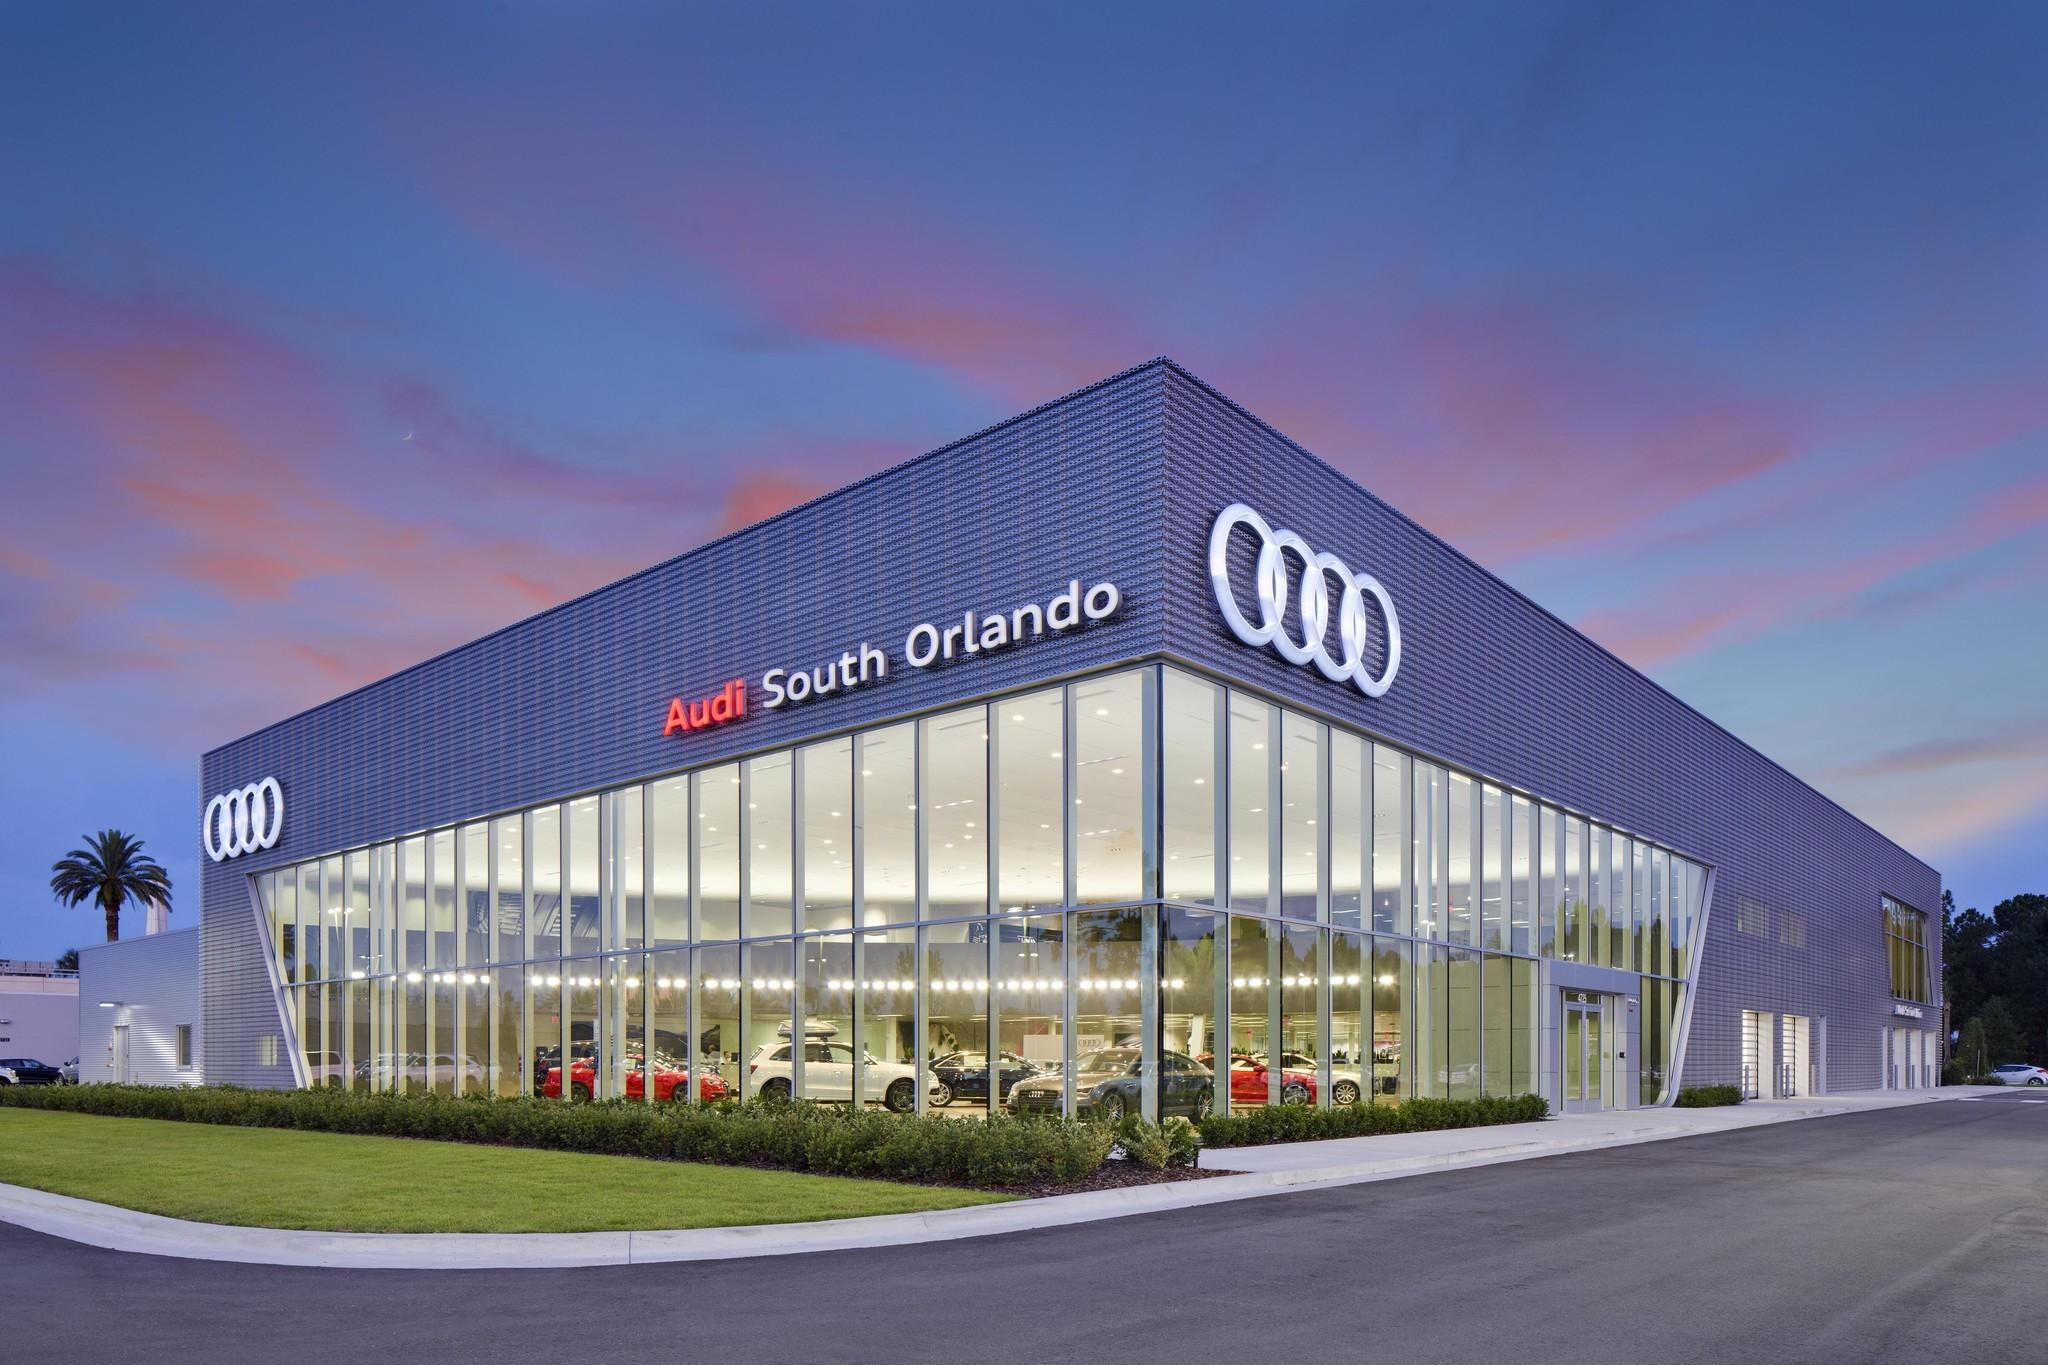 AutoNation Opens M Audi South Orlando Orlando Sentinel - Audi south orlando